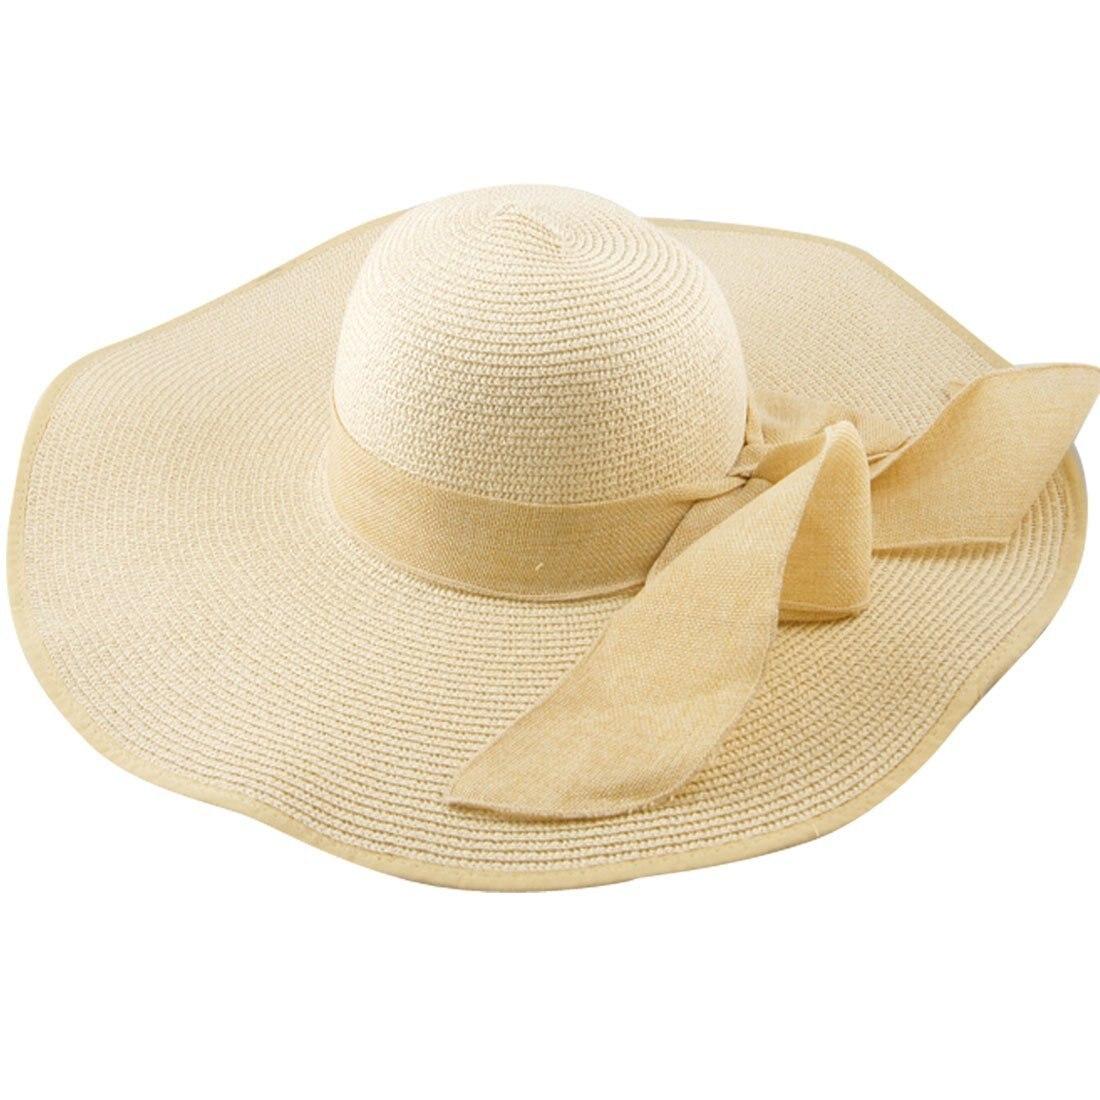 d121746e42c ⑦Womens Large Folding Wide Brim Floppy Fold Summer Beach Sun Hat ...